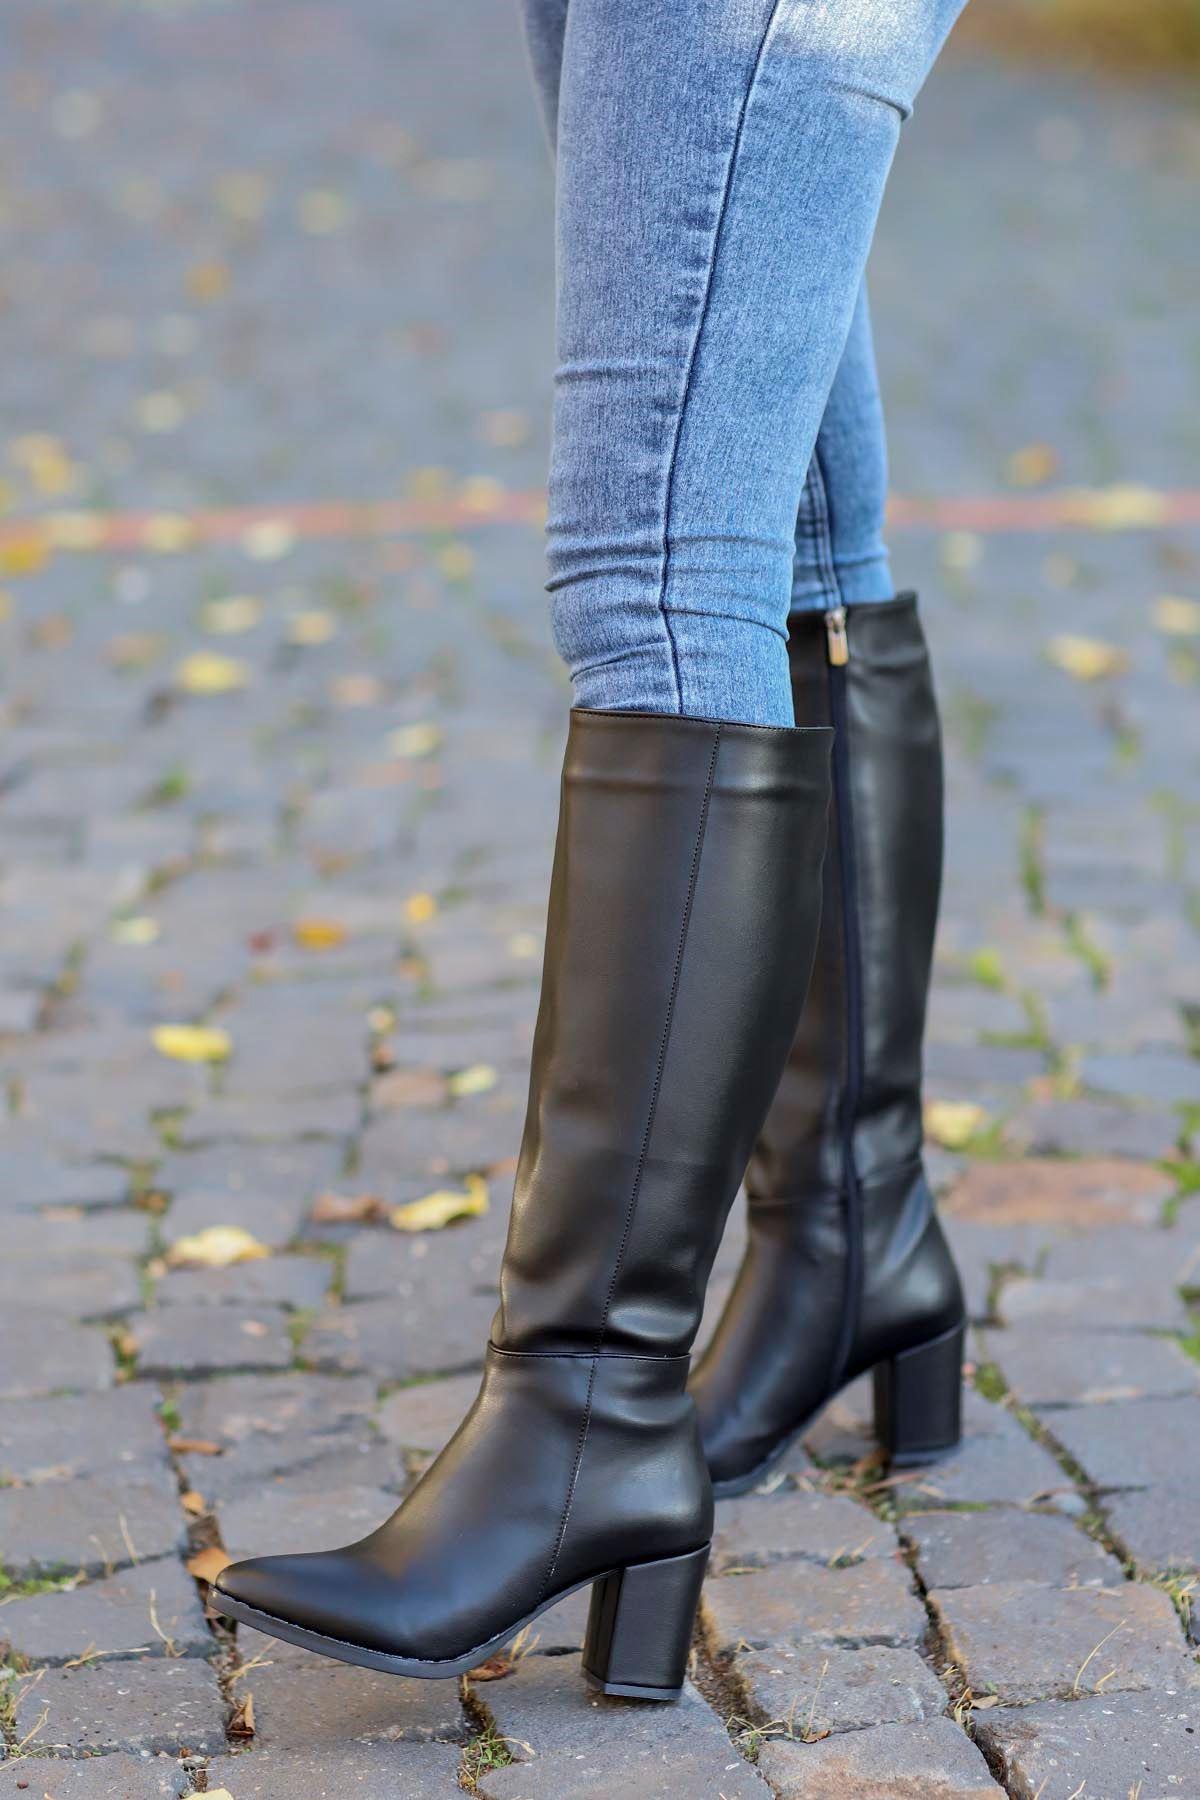 mami-5110 Diz Altı Çizme Siyah Deri